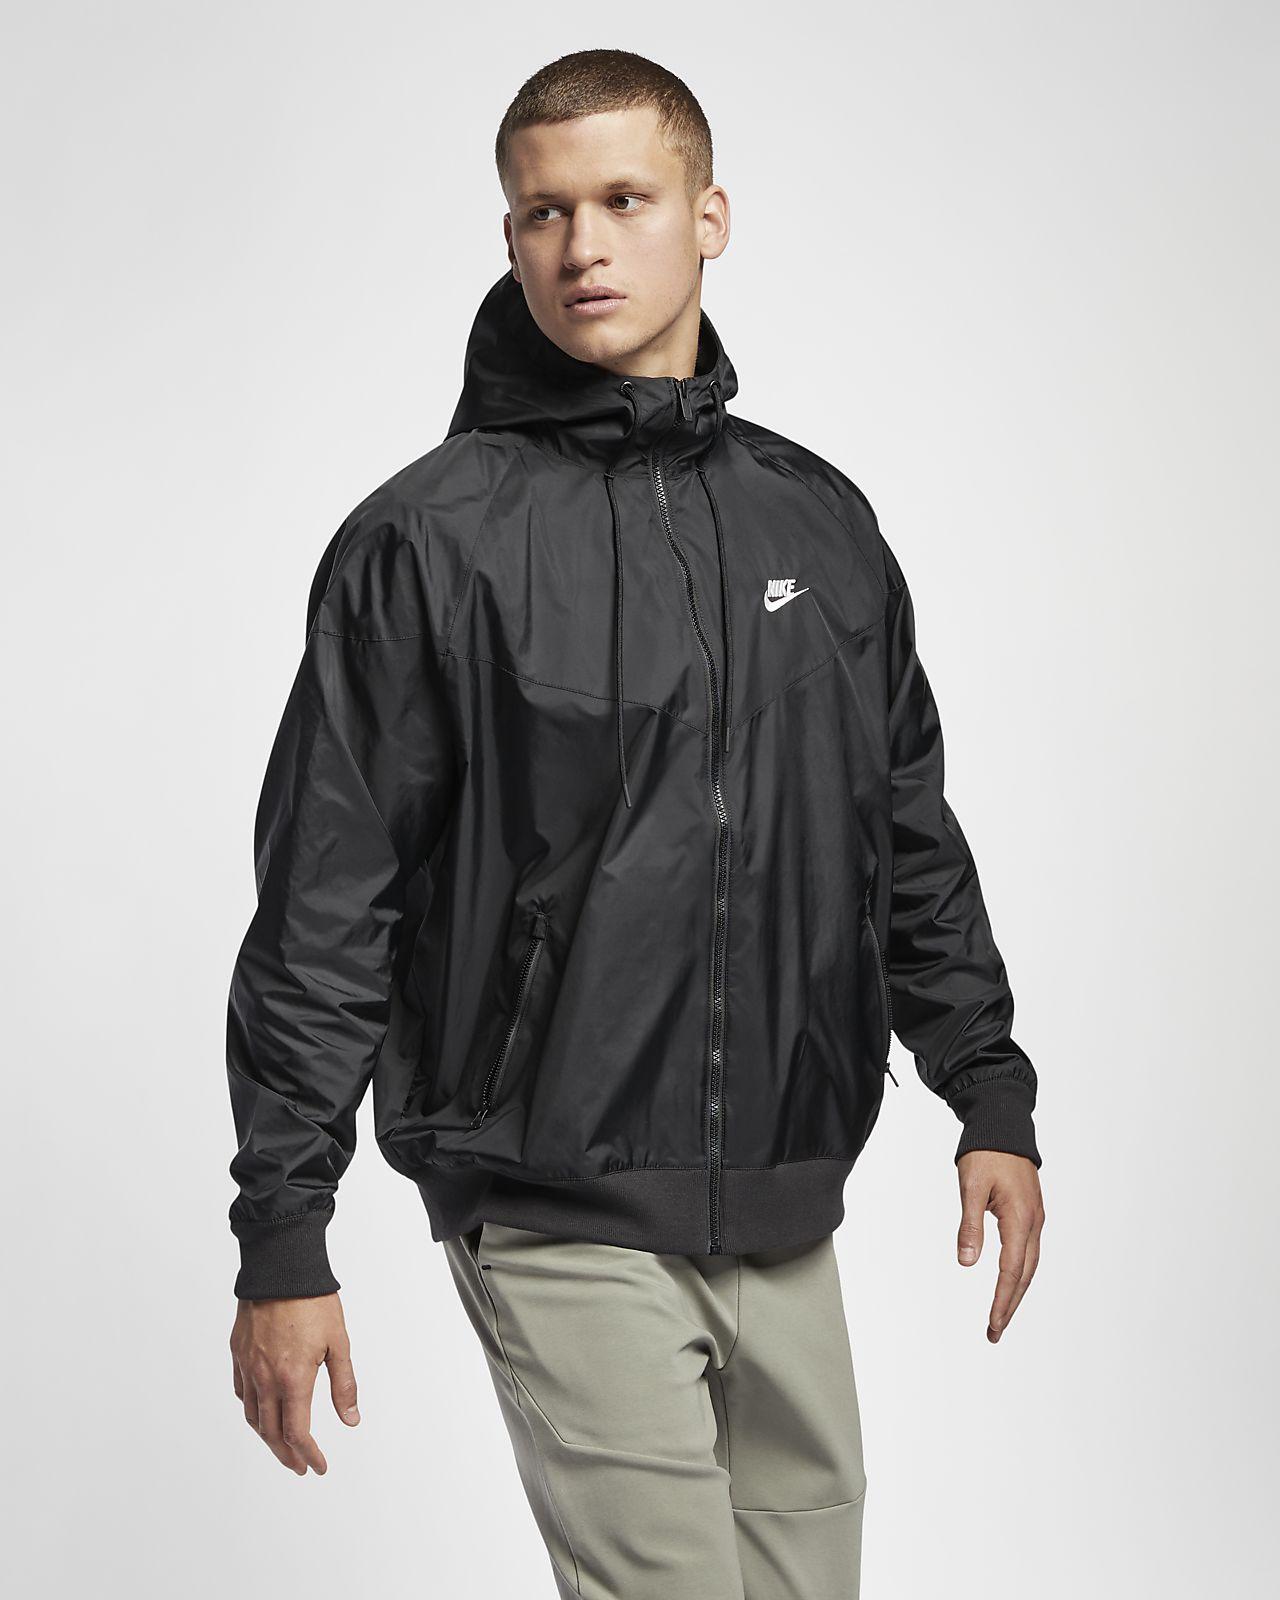 Herren Windbreaker Sportswear Windrunner Nike Mit Kapuze SzqGLpVUM